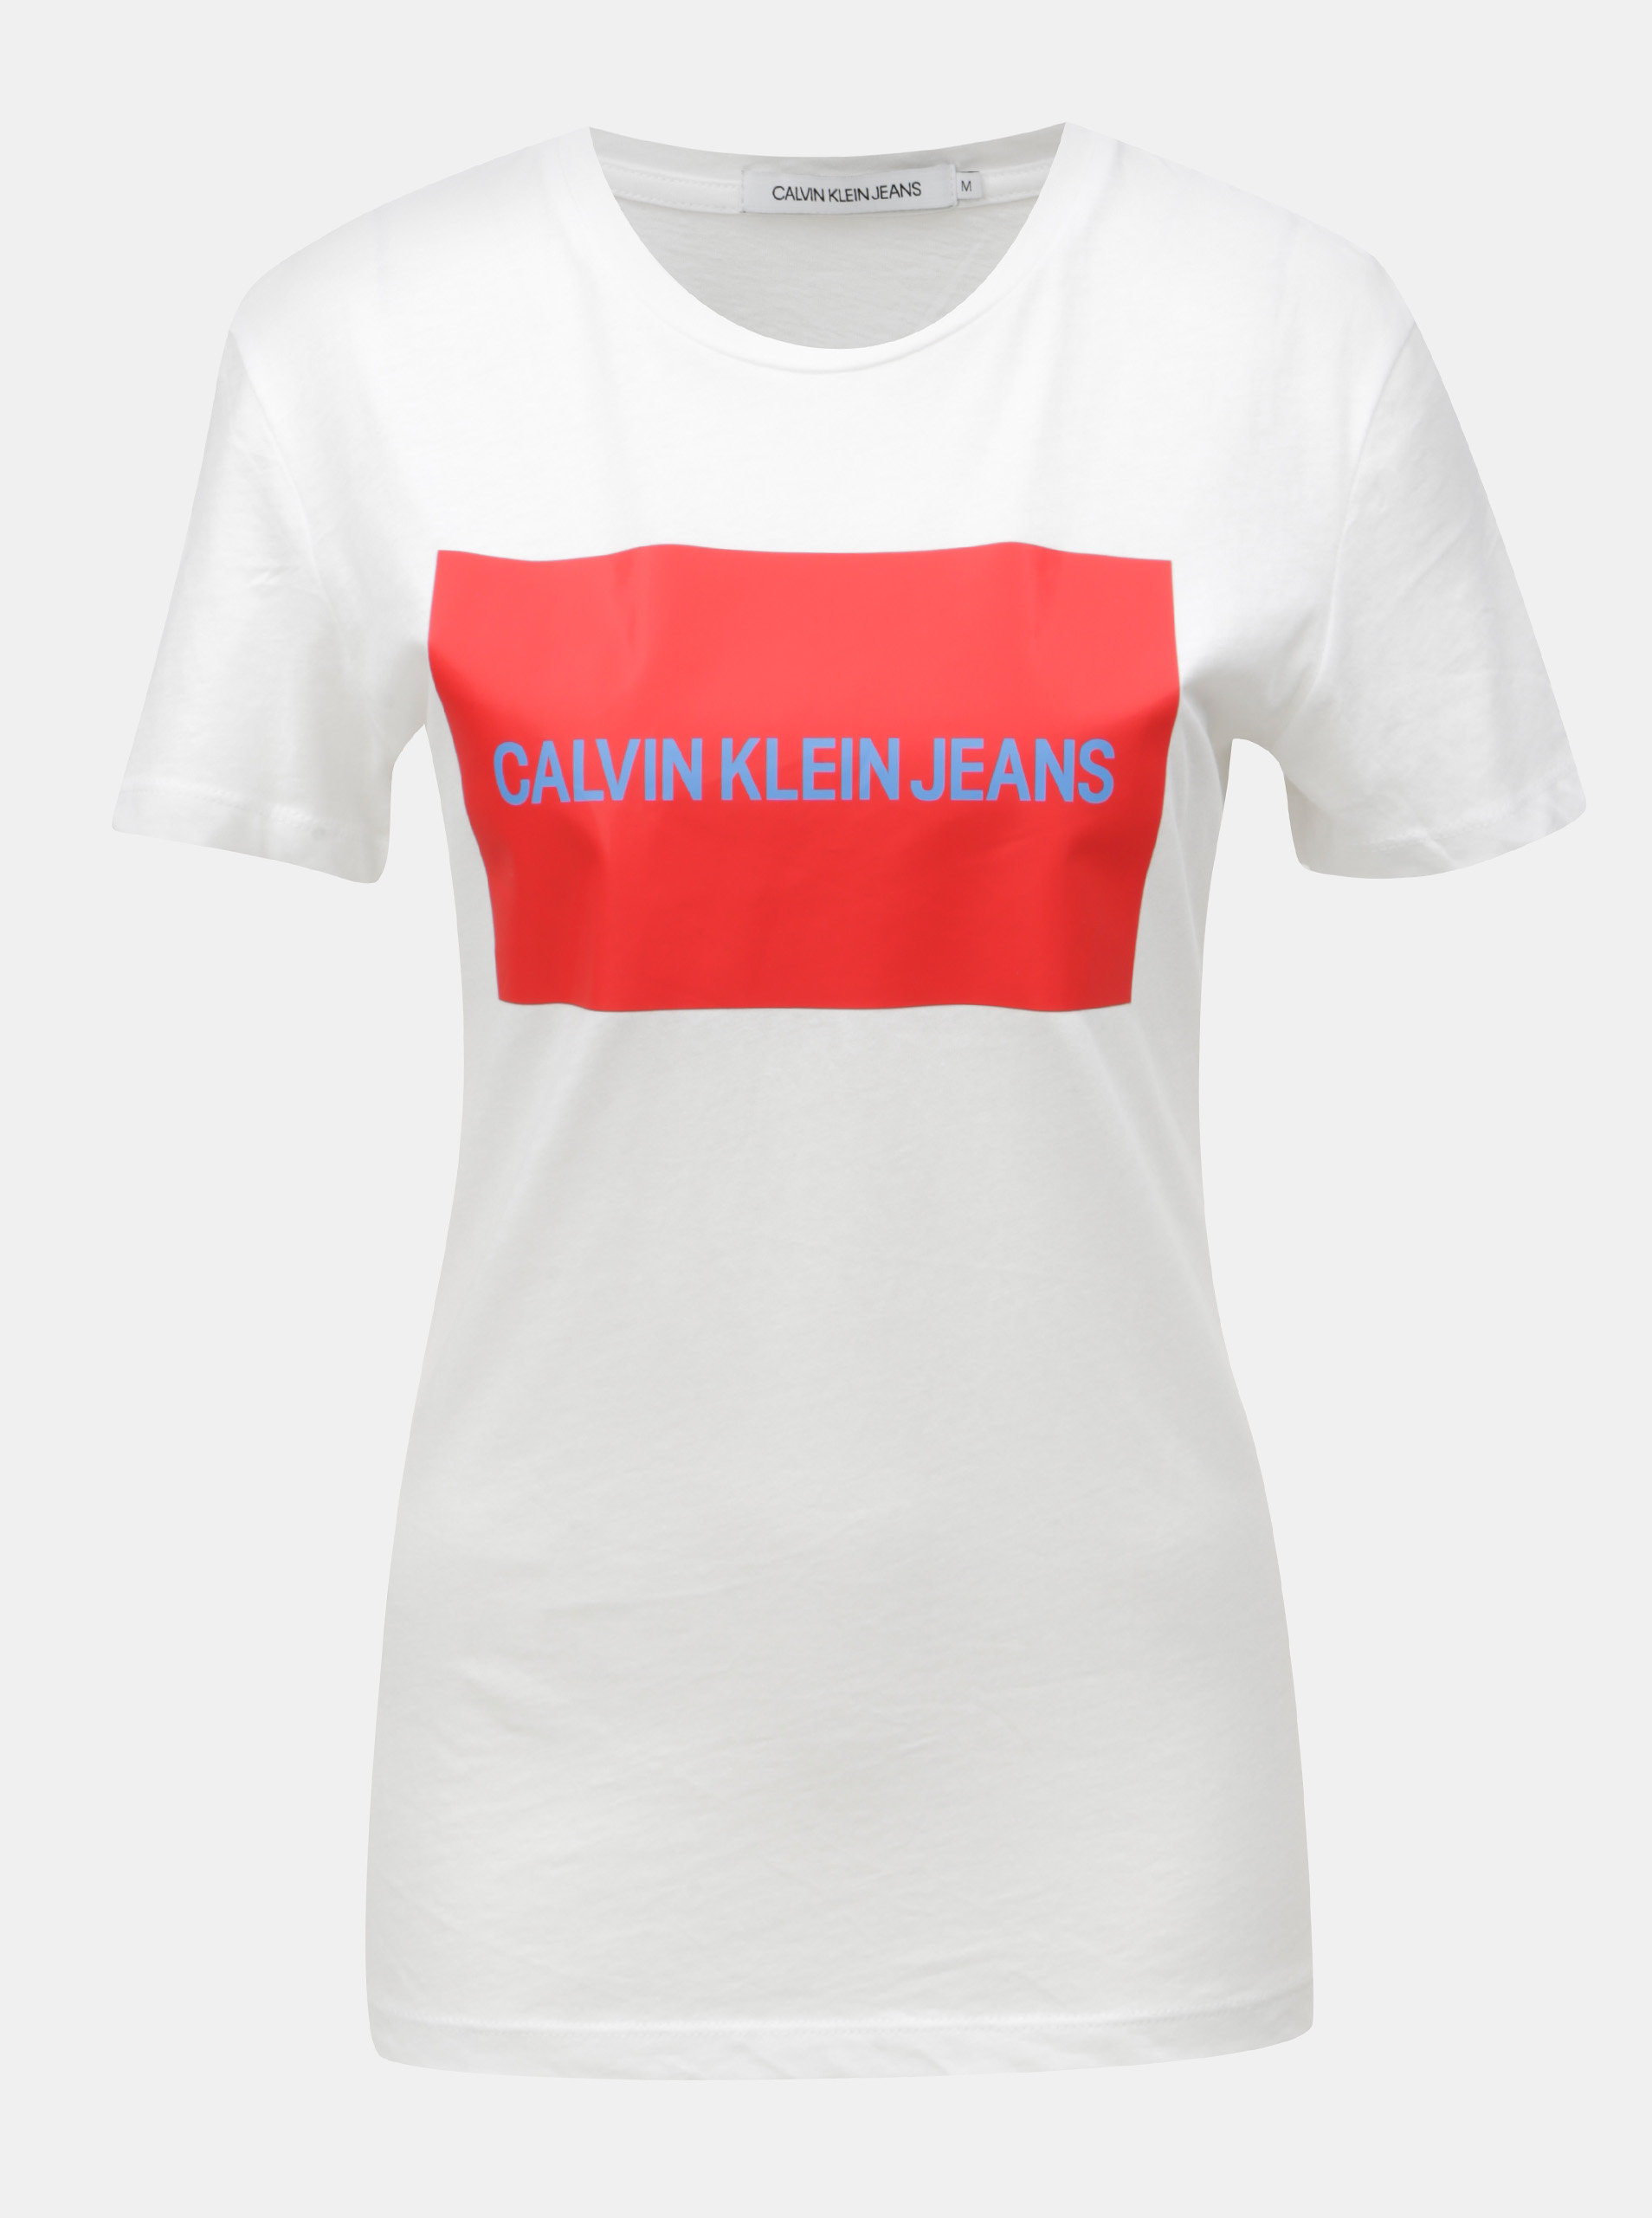 Biele dámske tričko s potlačou Calvin Klein Jeans ... 0e5faef56b1